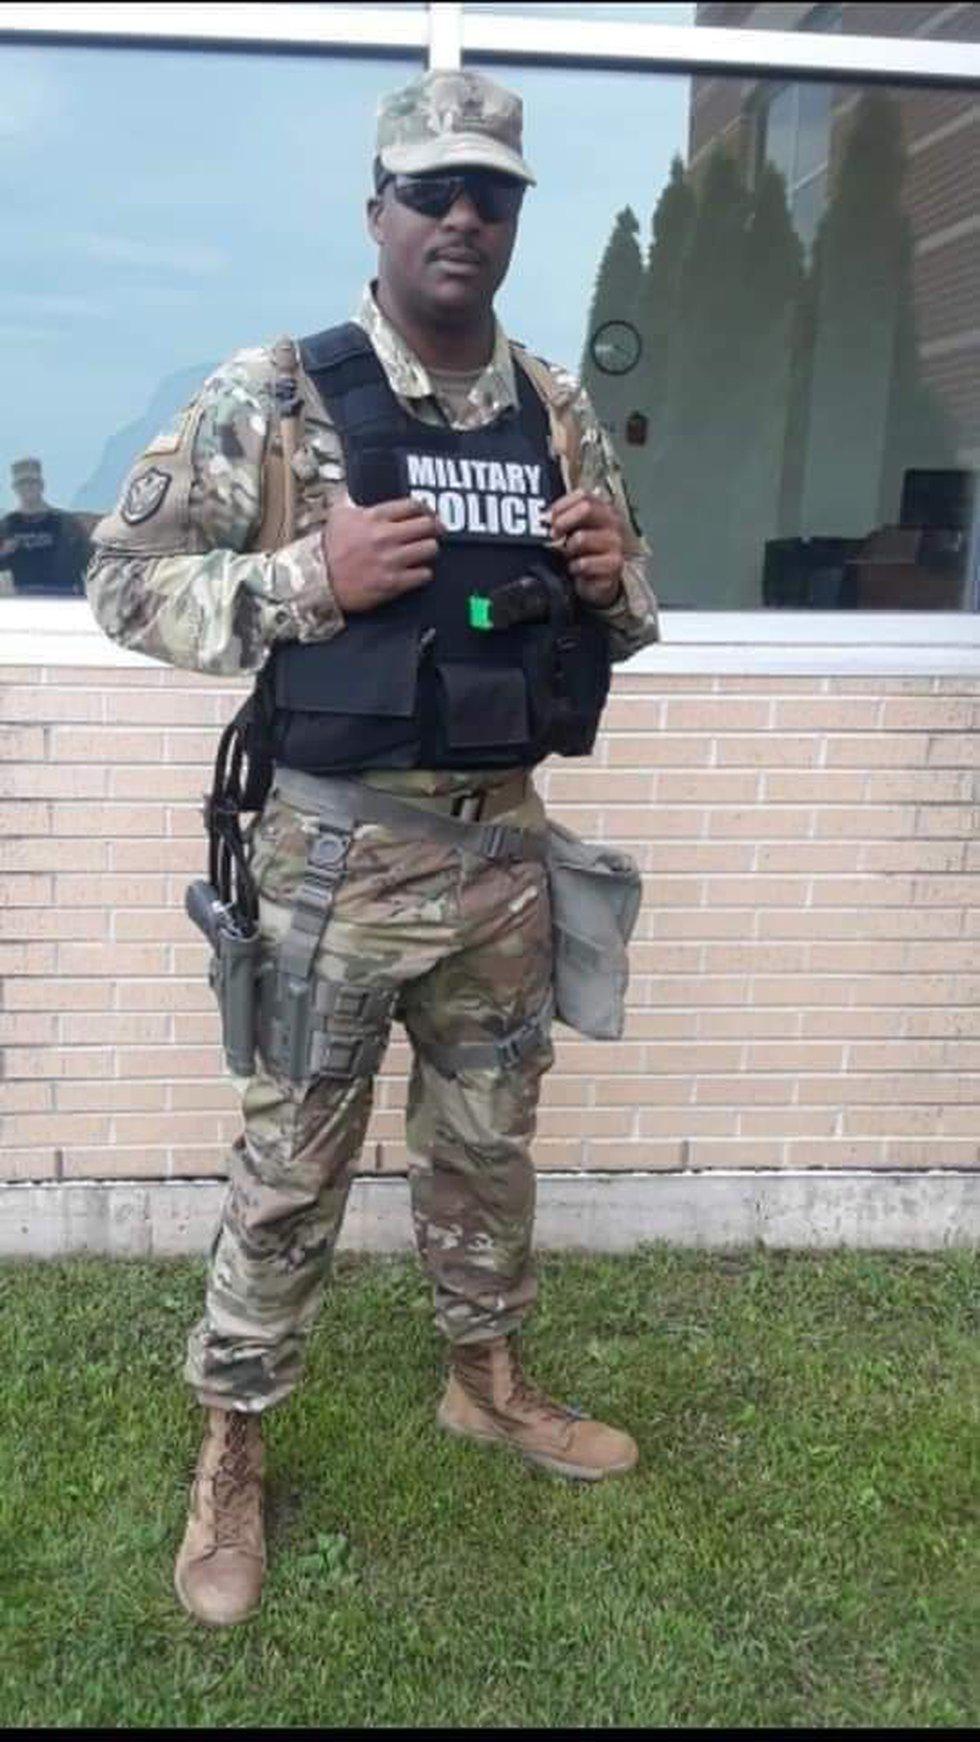 Sgt. Chris Diltz